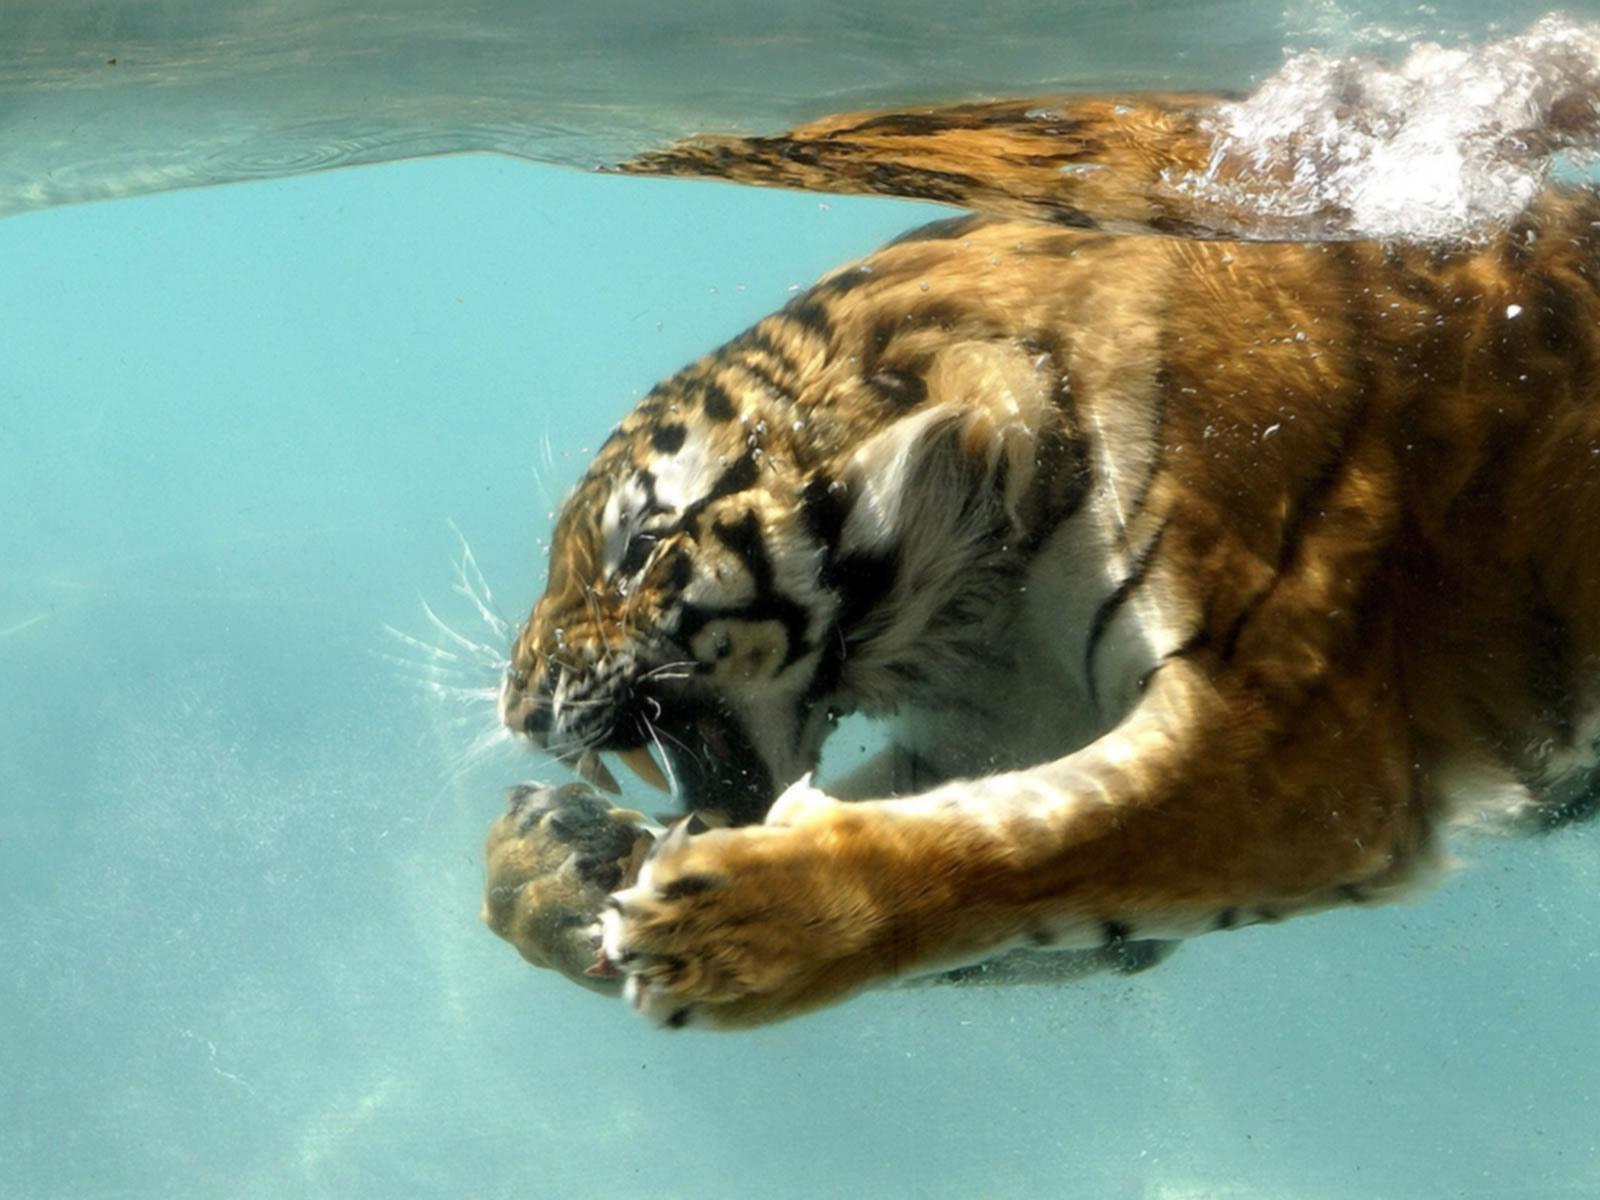 Hd Images Of The Wild Animals Wallpapers And Backgrounds: En Güzel HD Masaüstü Kaplan Resimleri